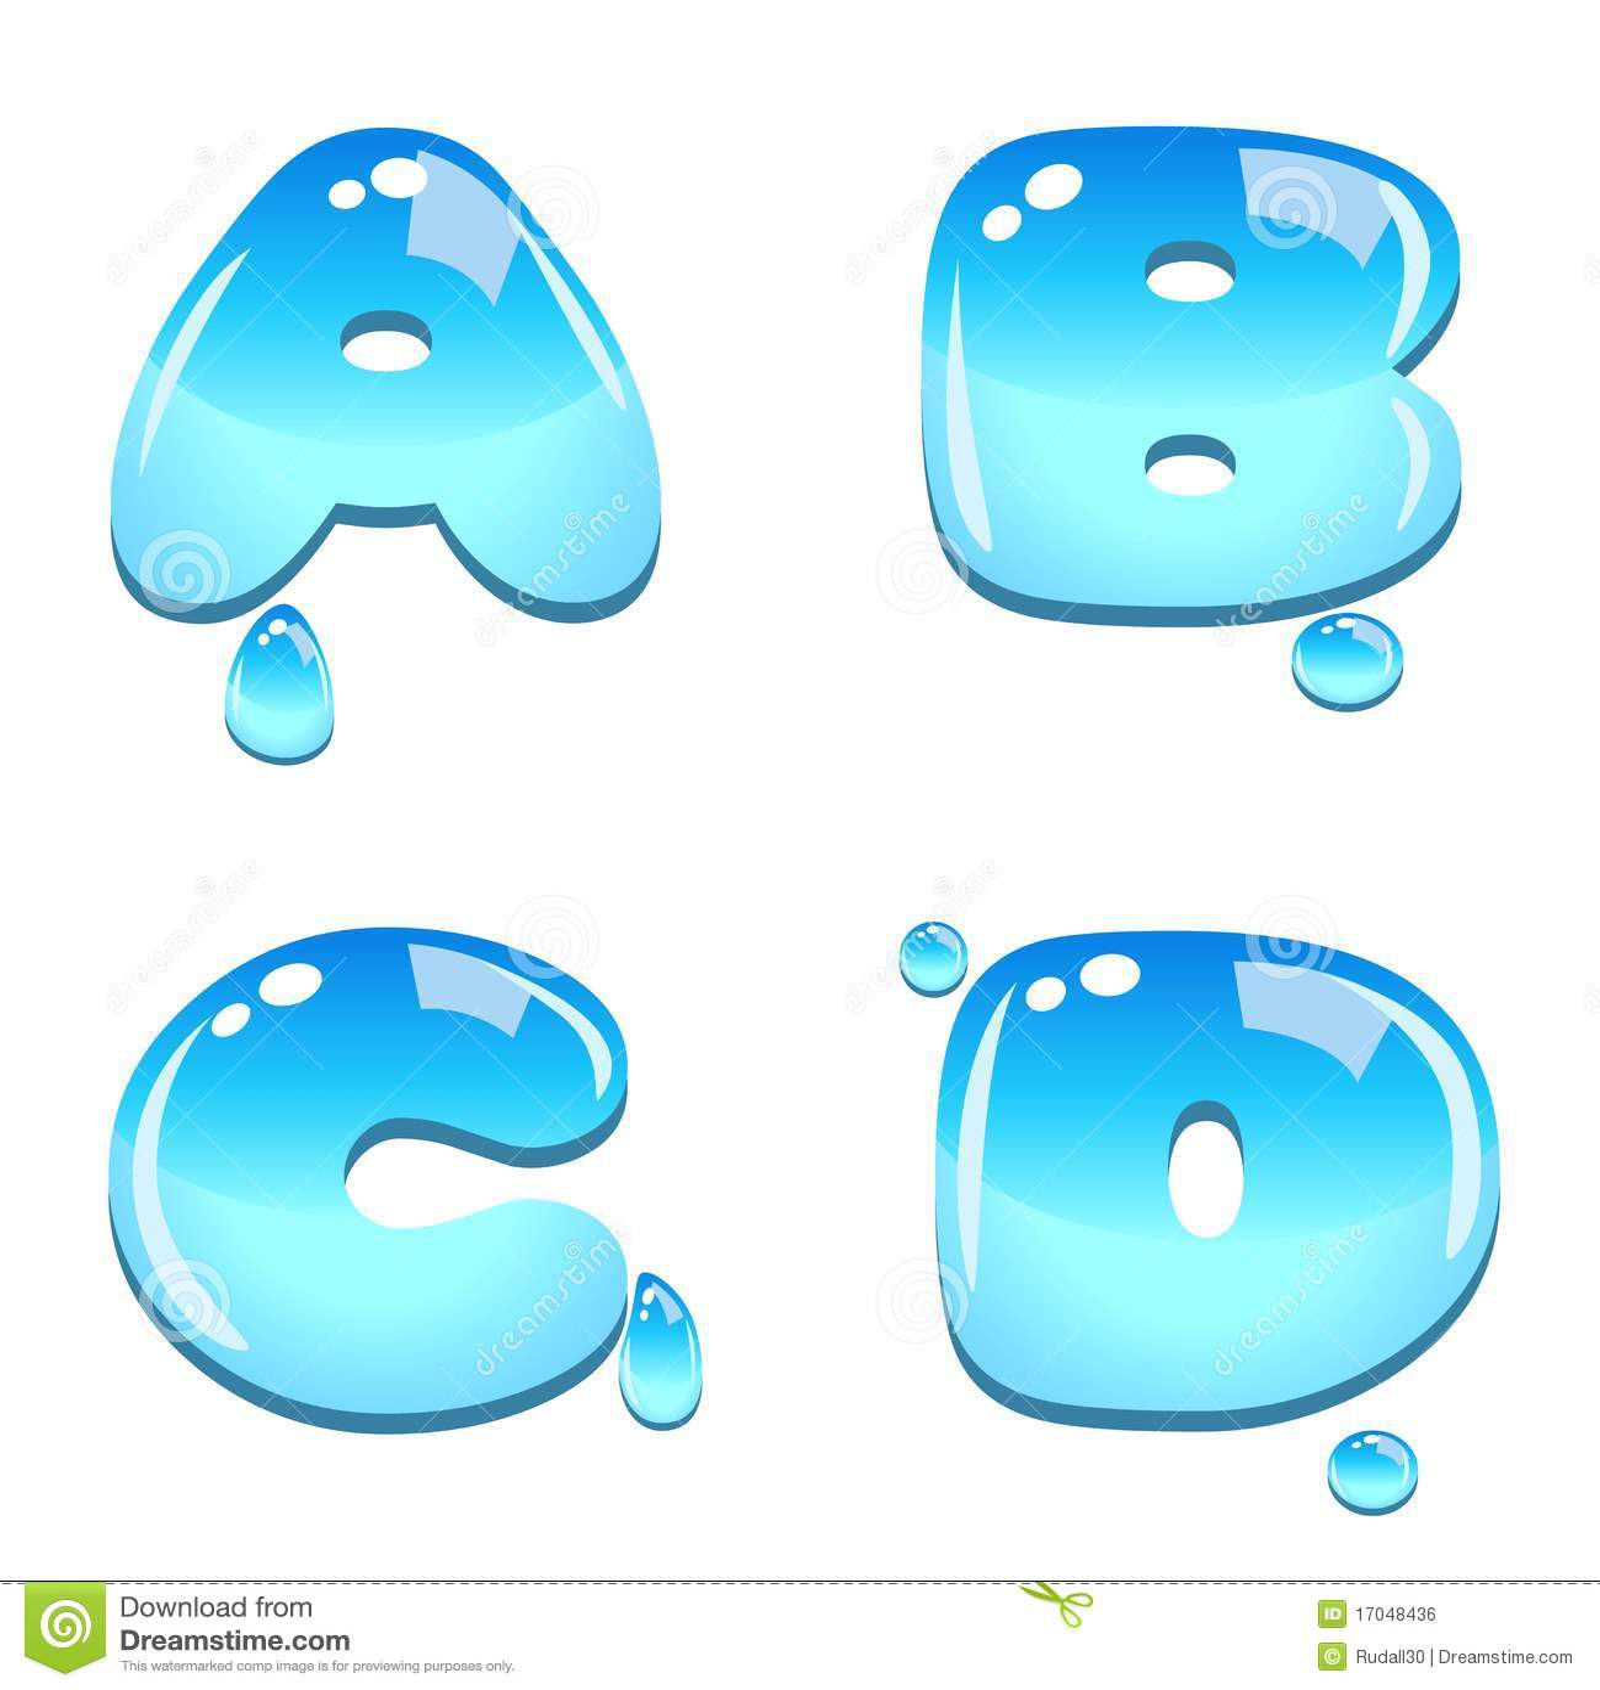 Water Bead Font Type Royalty Free Stock Image - Image: 17048436